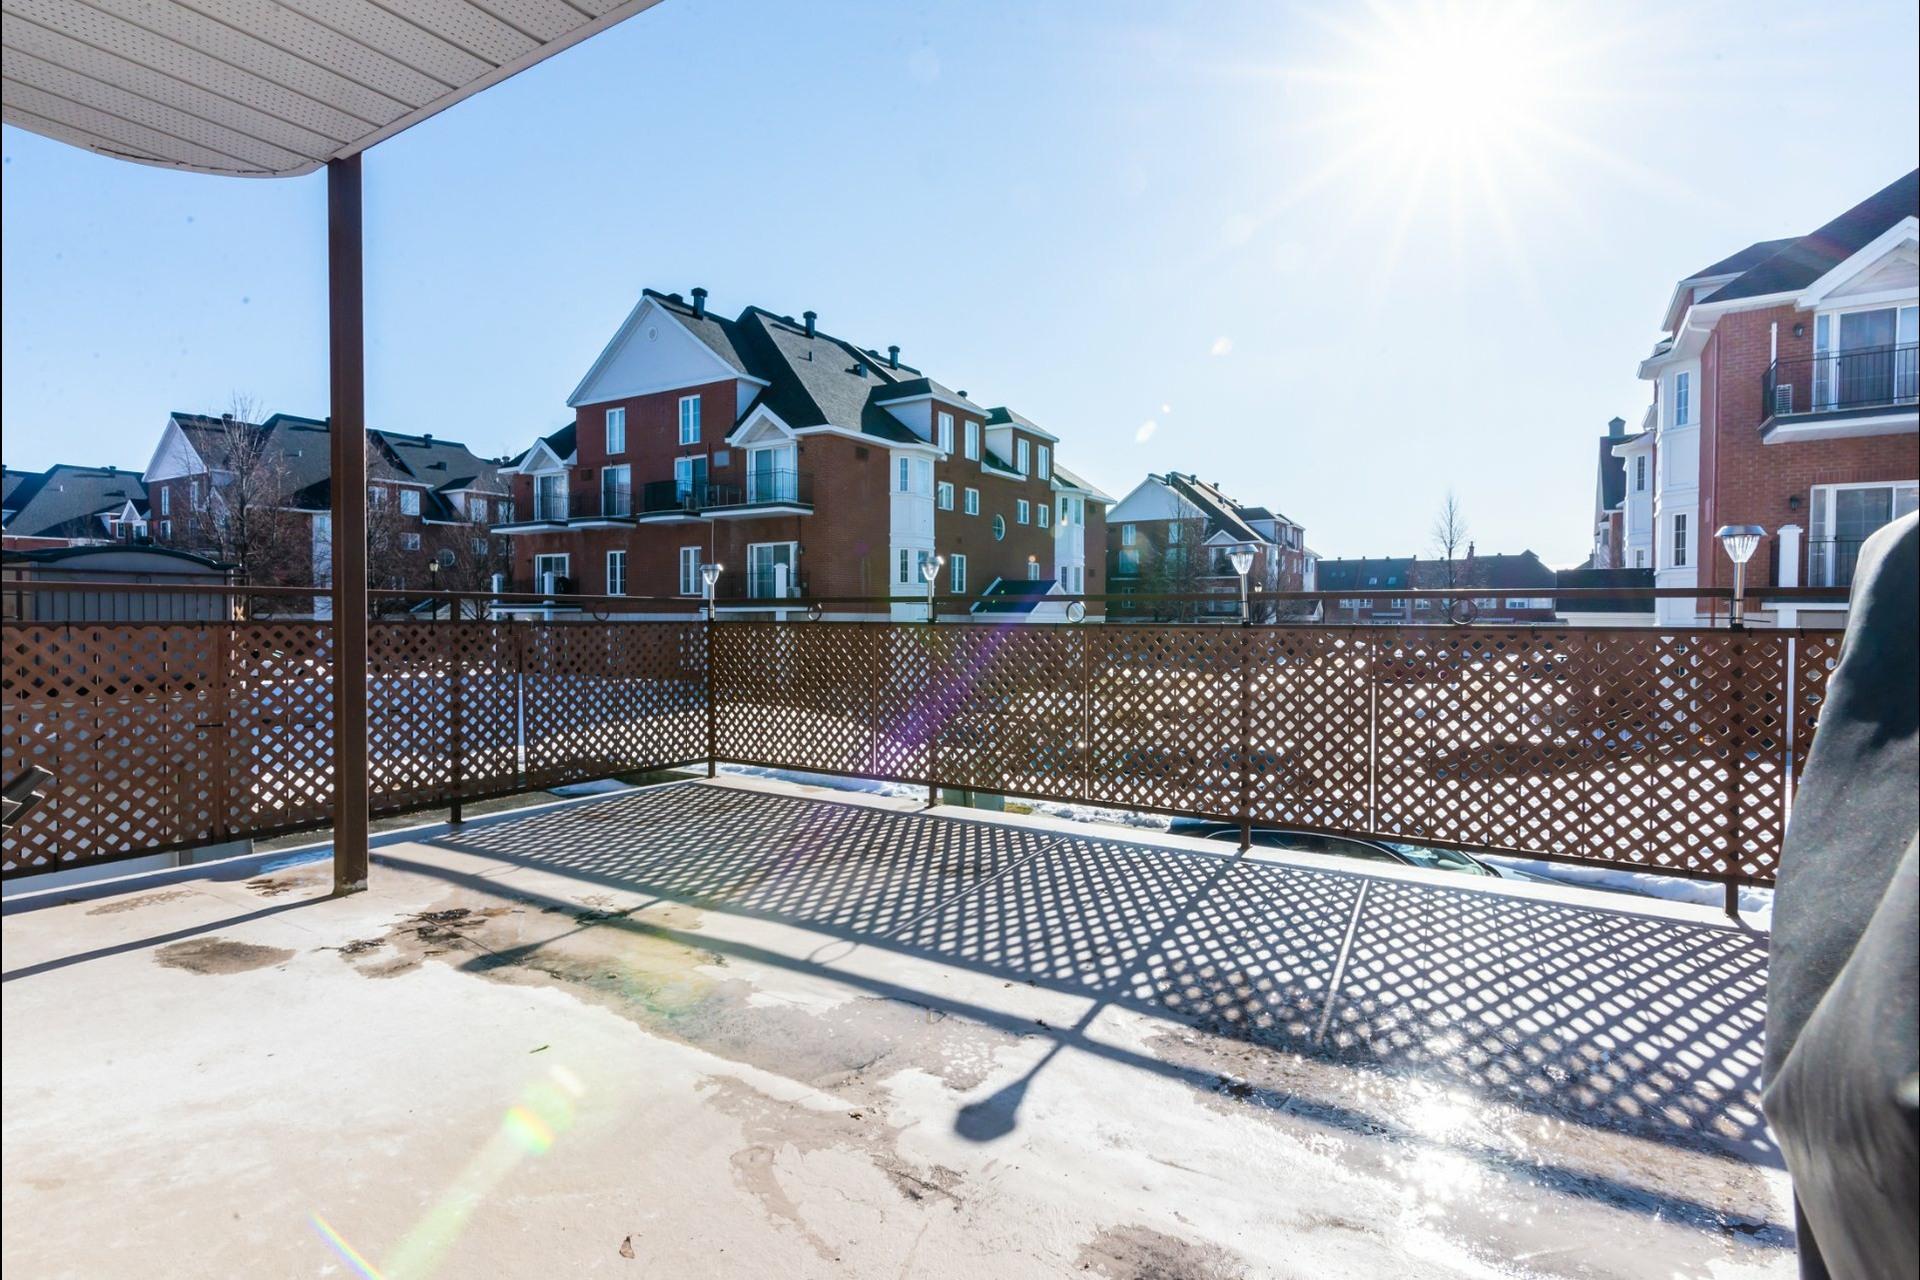 image 14 - Departamento En venta Saint-Laurent Montréal  - 4 habitaciones